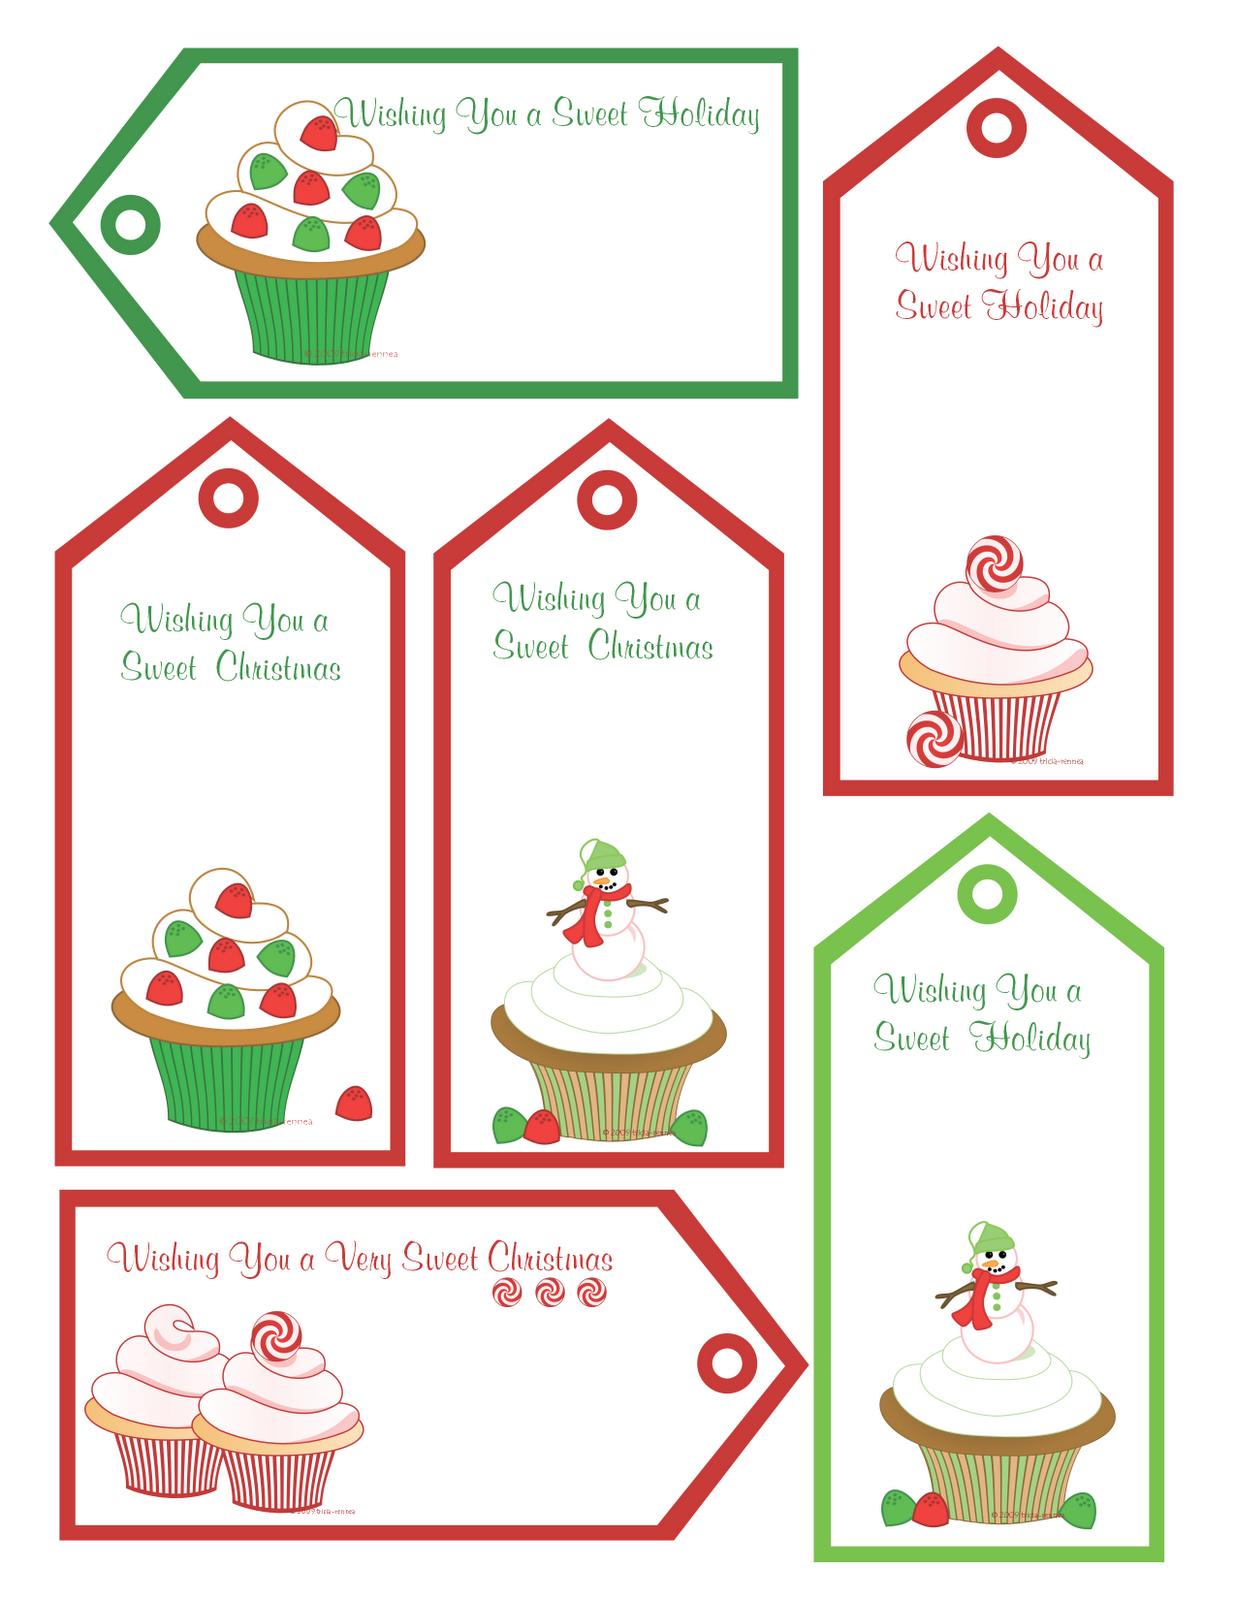 FREE Christmas Printables, Gift Tags & Homemade Gift Ideas